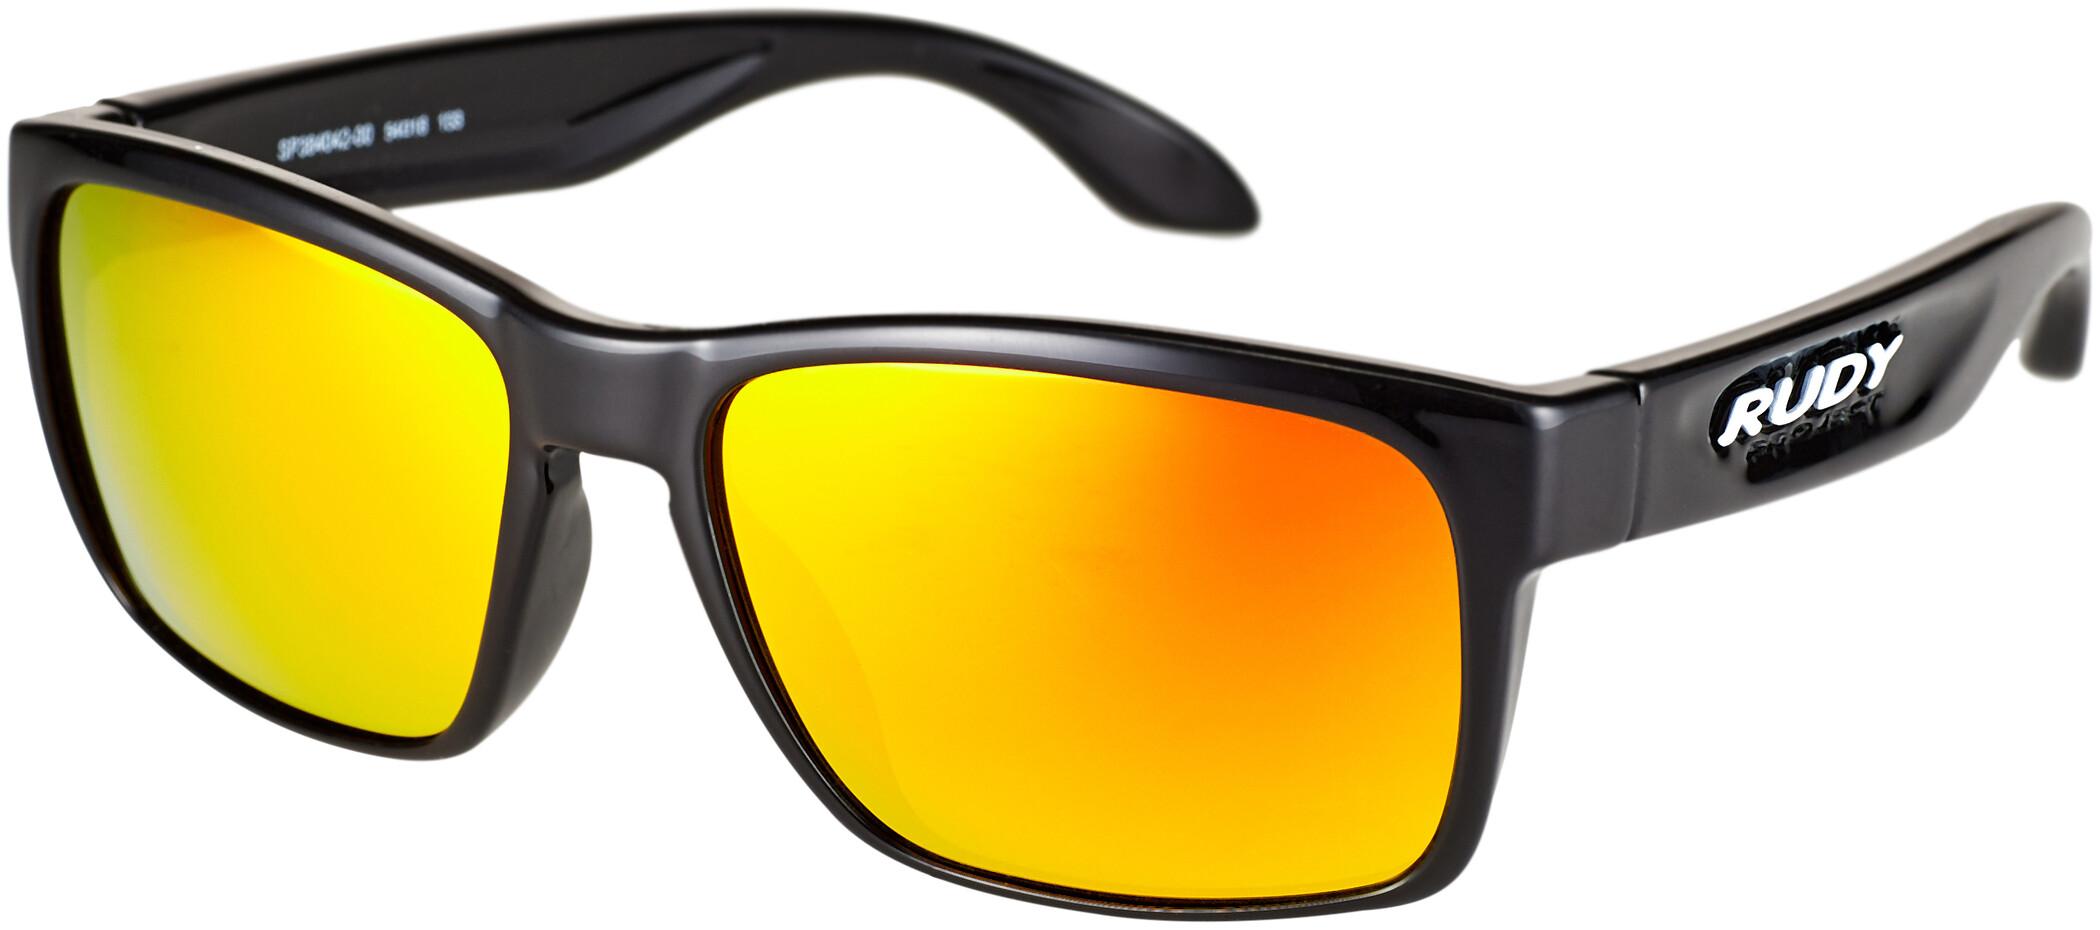 Rudy Project Spinhawk Slim Cykelbriller, black gloss - rp optics multilaser orange | Briller